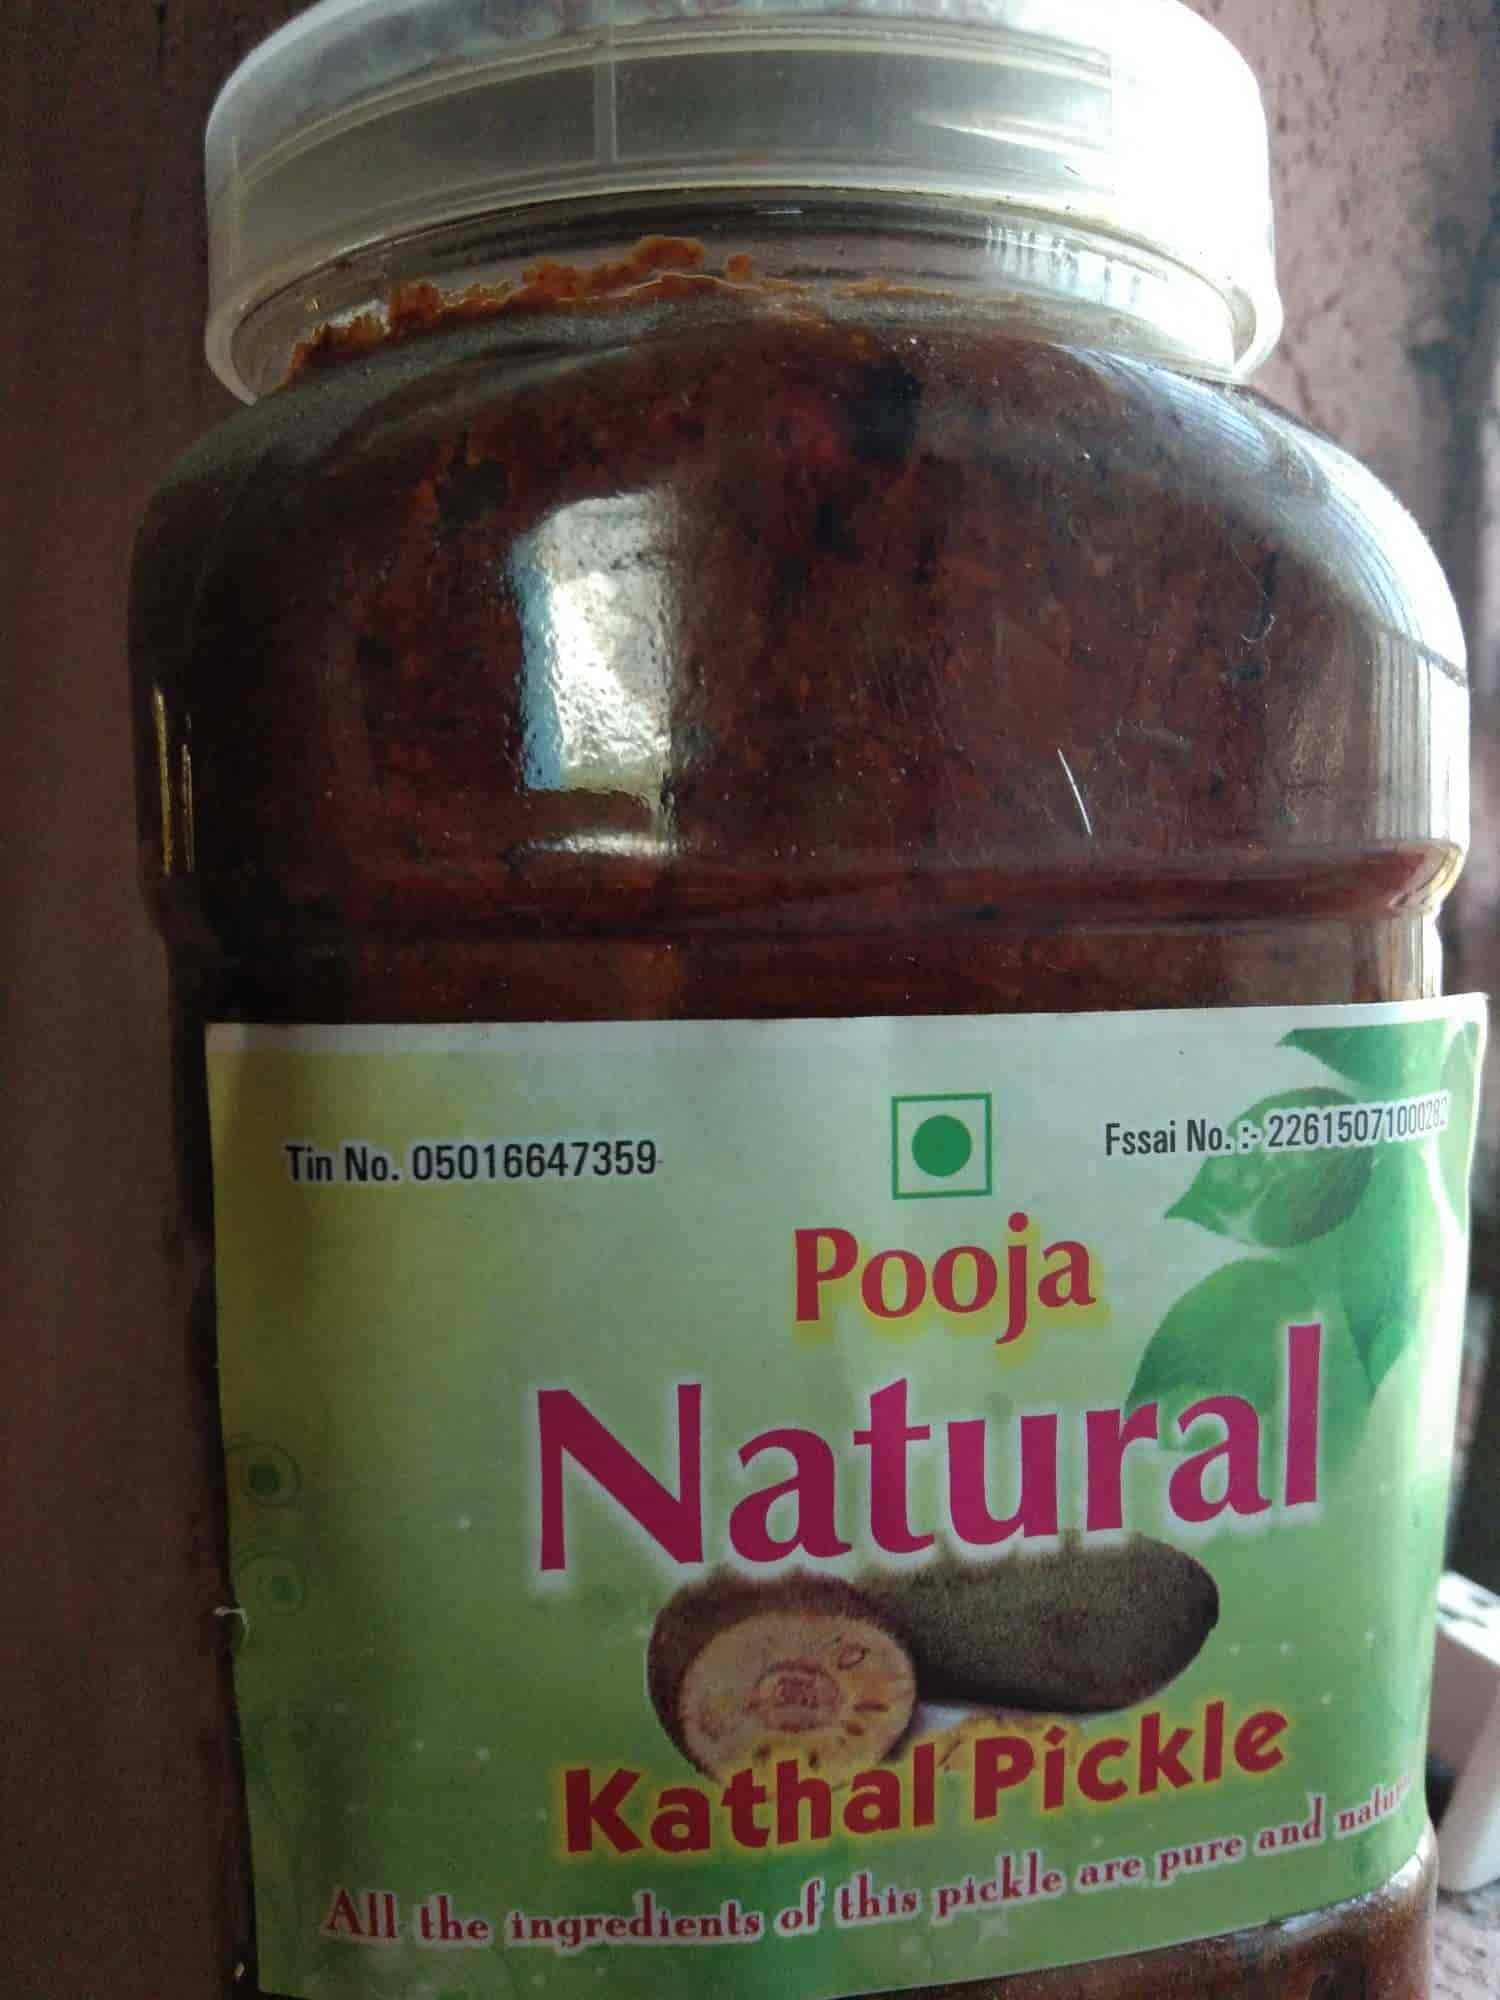 Pooja Food Product - Fruit Jam Dealers in Kashipur - Justdial